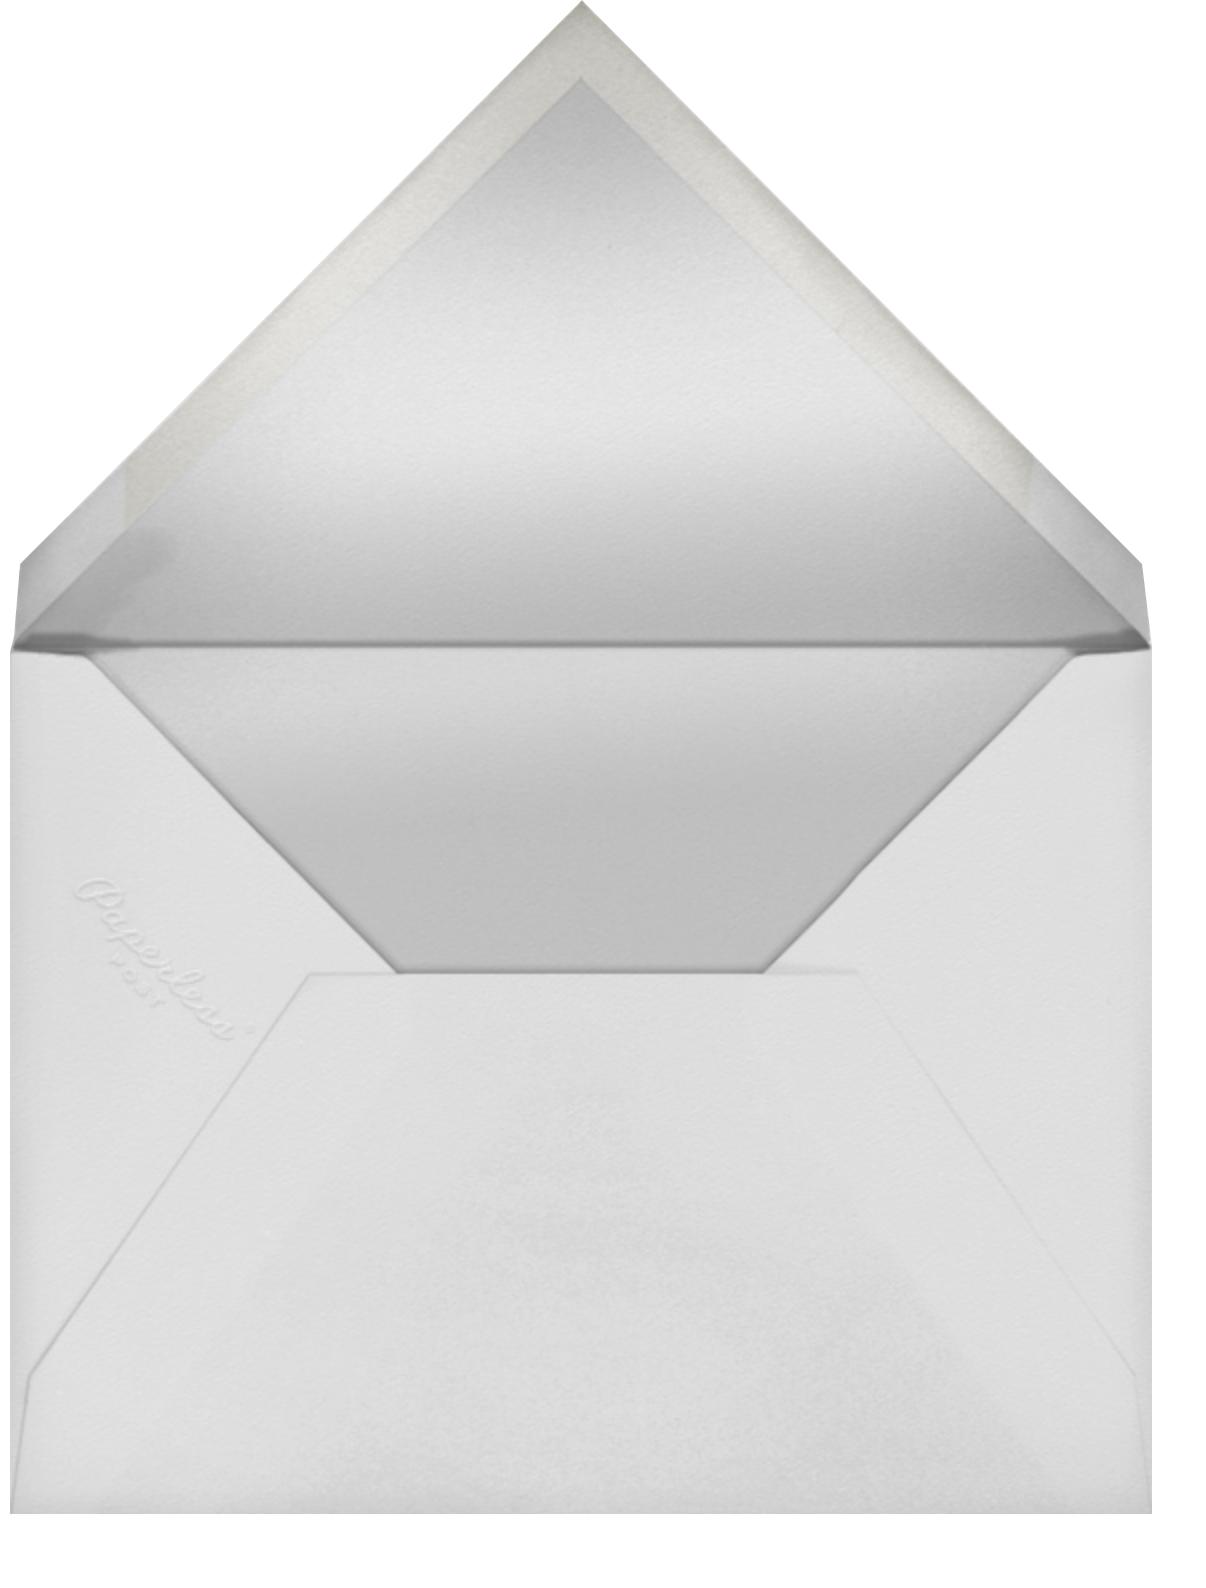 Moth Orchid (Menu) - Felix Doolittle - Menus - envelope back